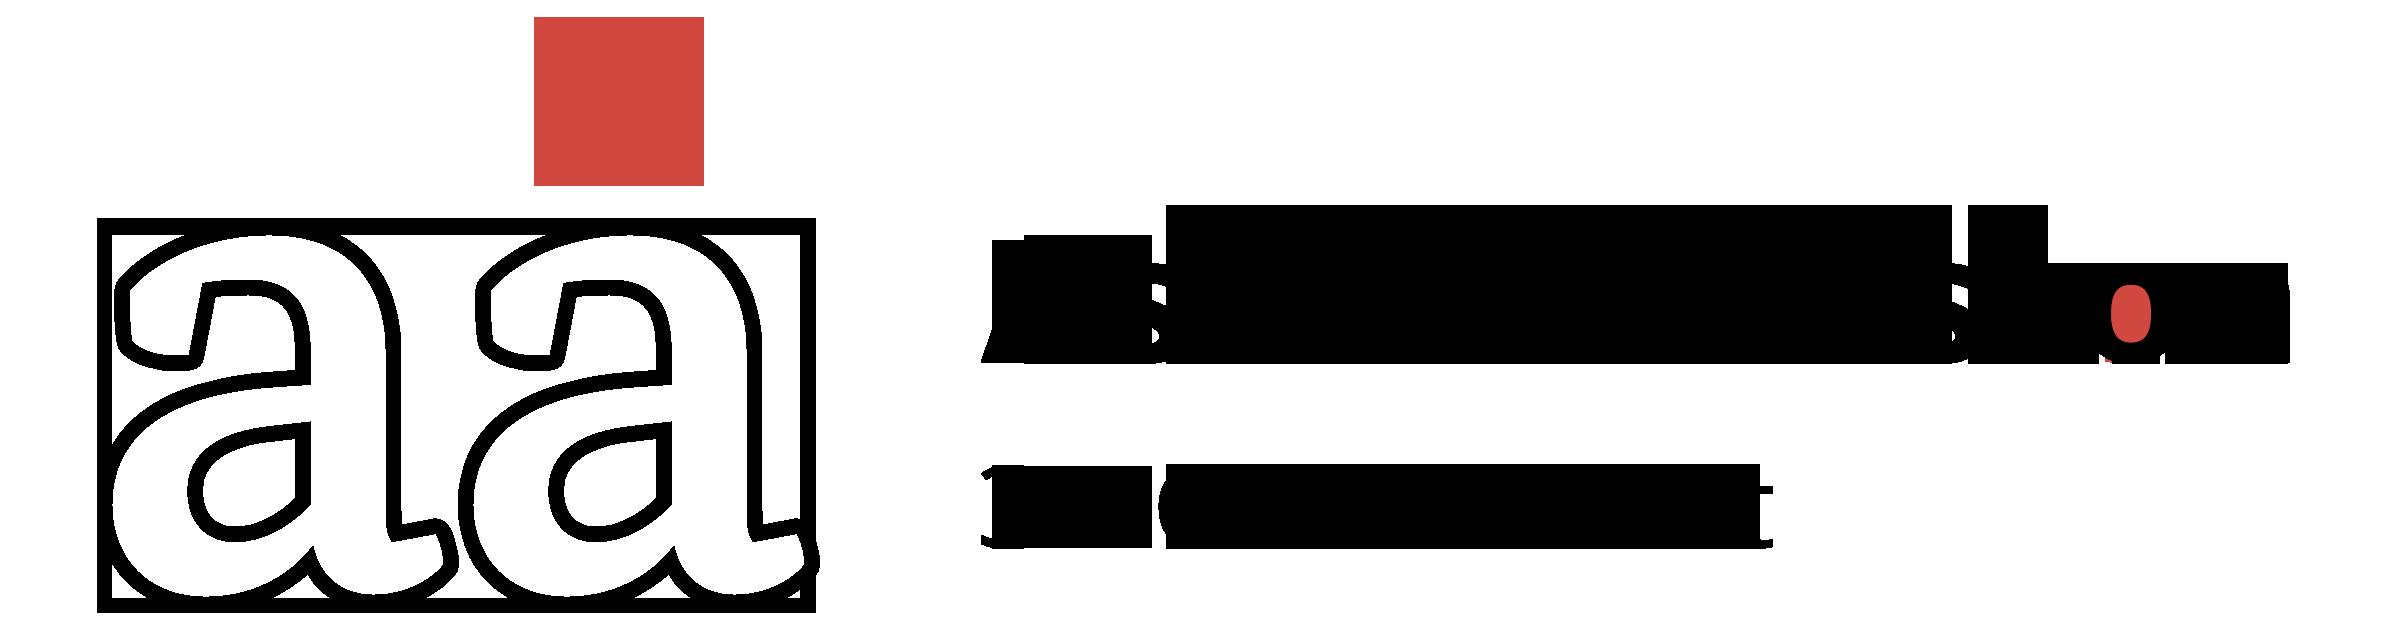 Cf6ae3ad2c2e0cccf8625c2005489894